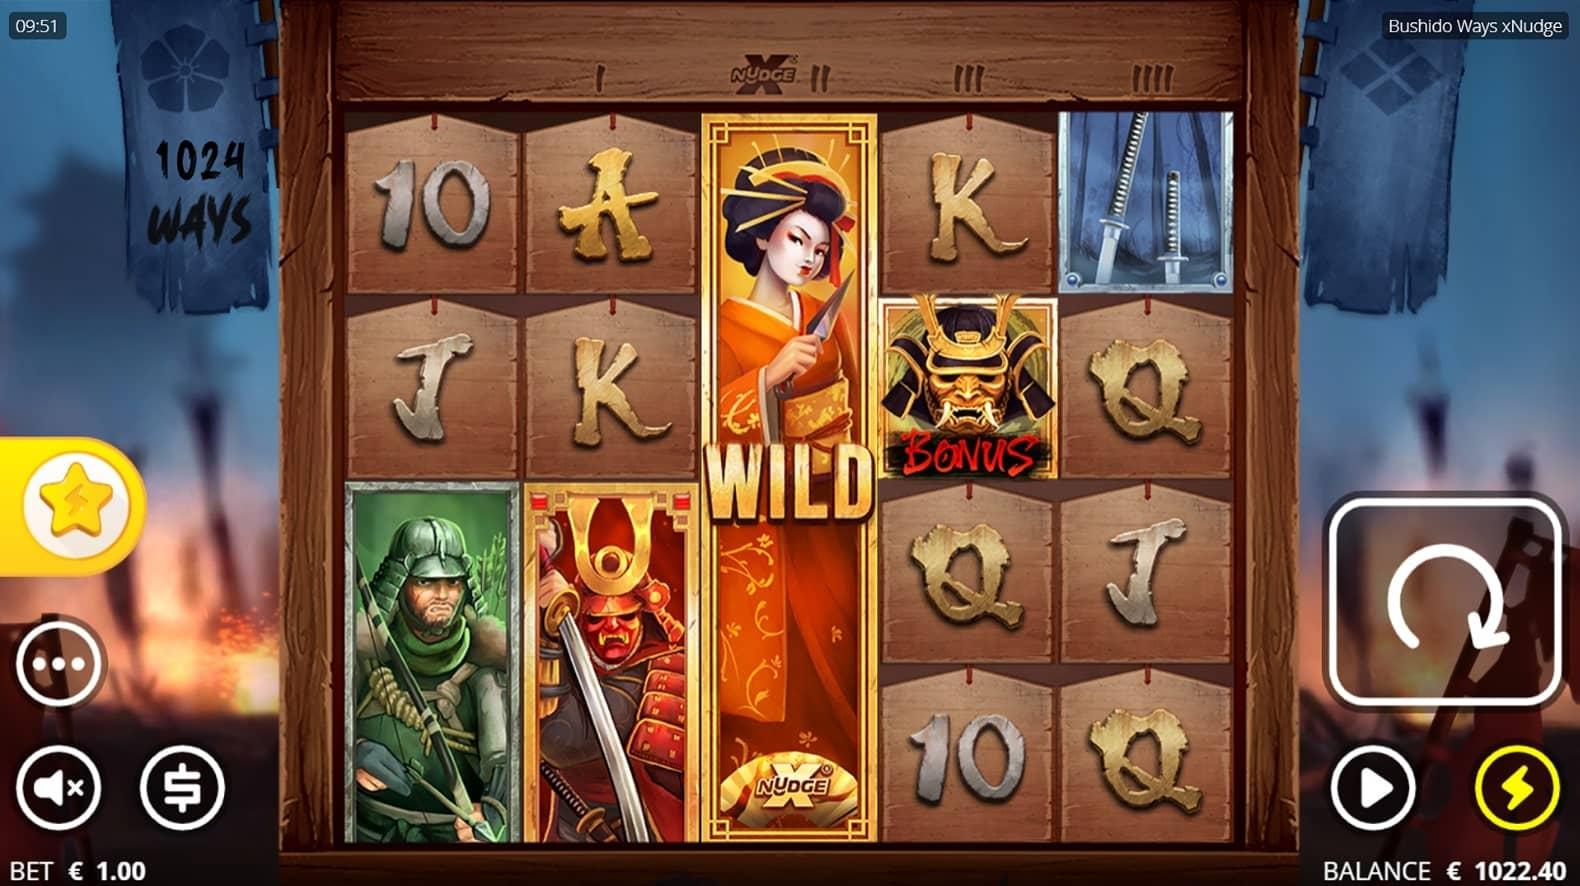 Bushido Slot Gameplay